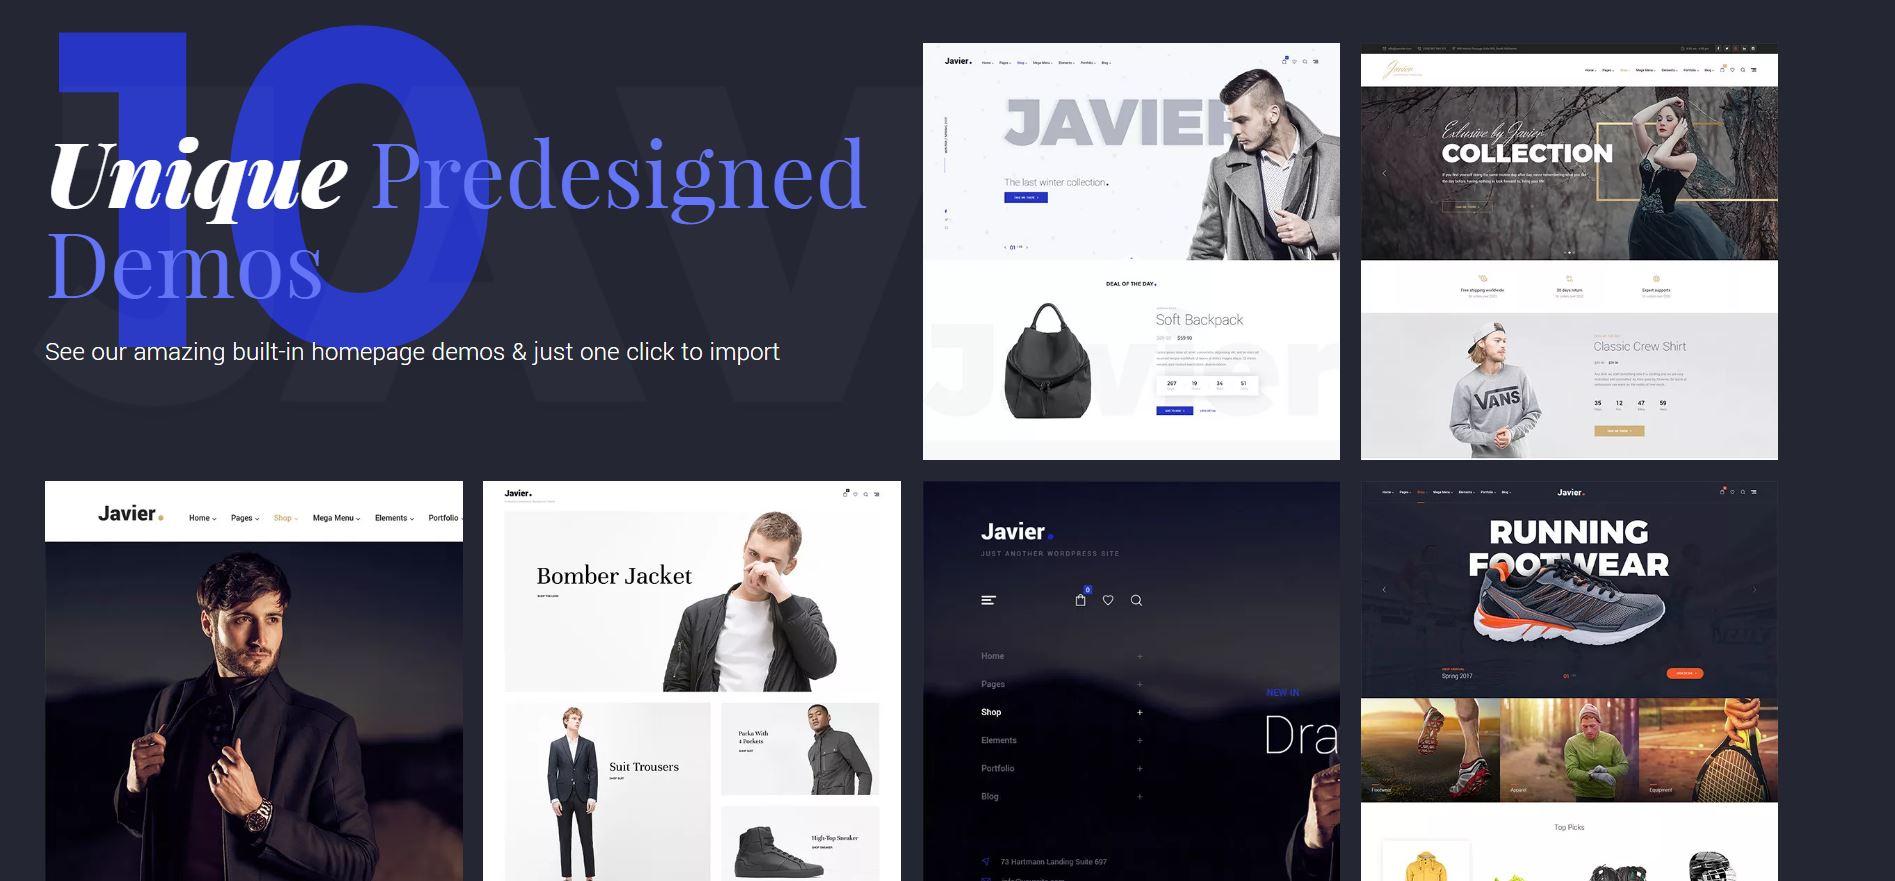 Wordpress theme for shops